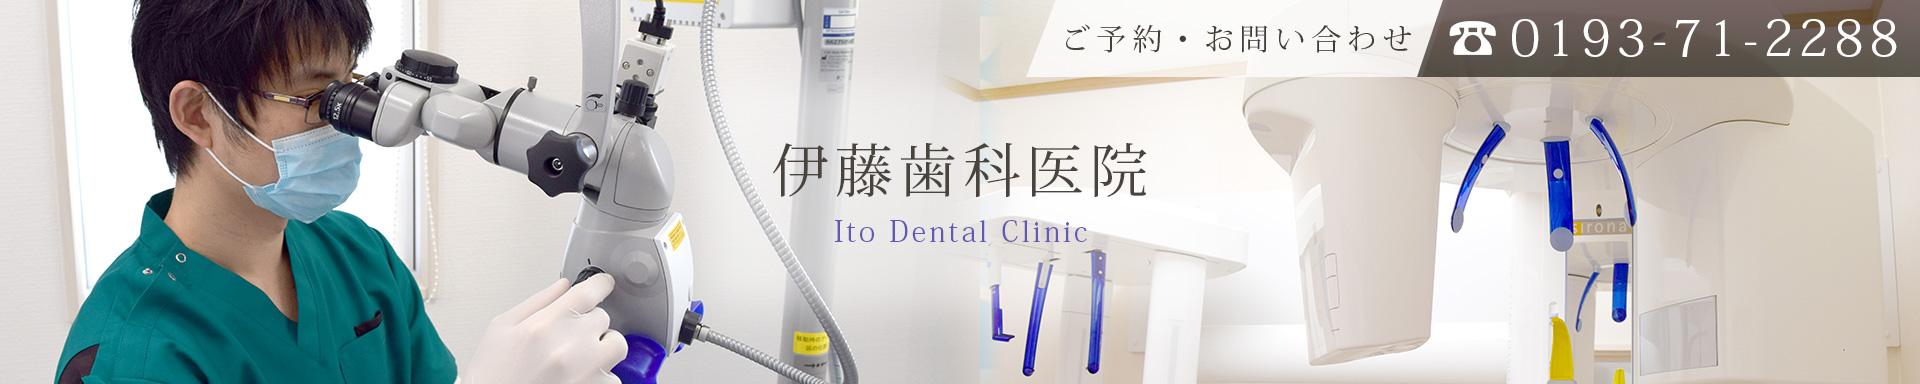 宮古市にある歯医者 - 伊藤歯科医院